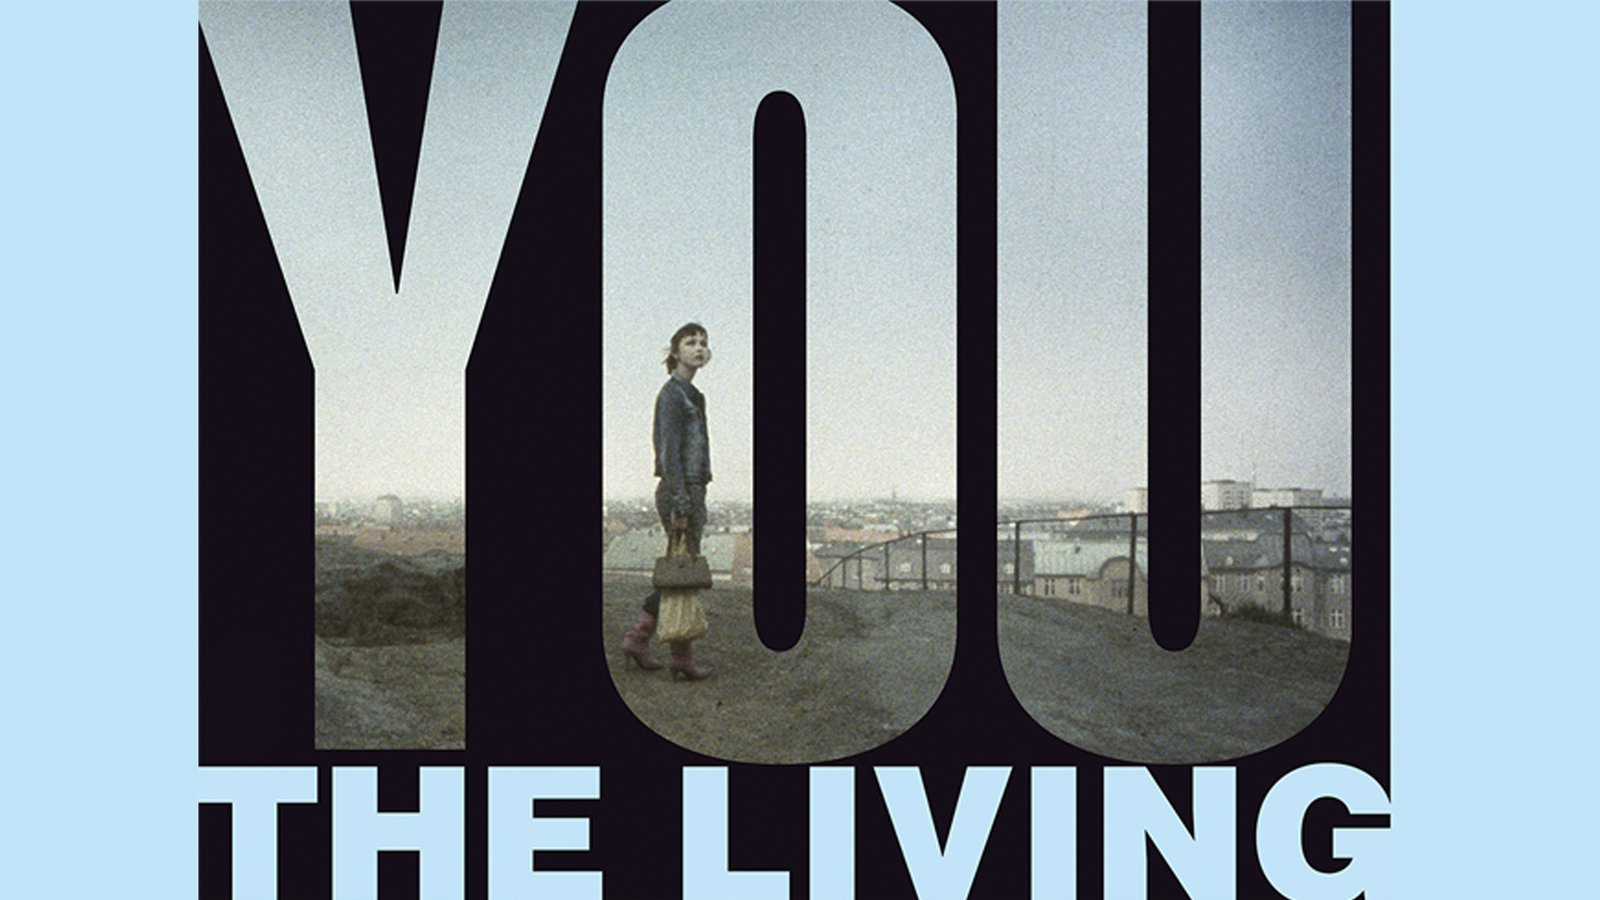 You, the Living - Du levande